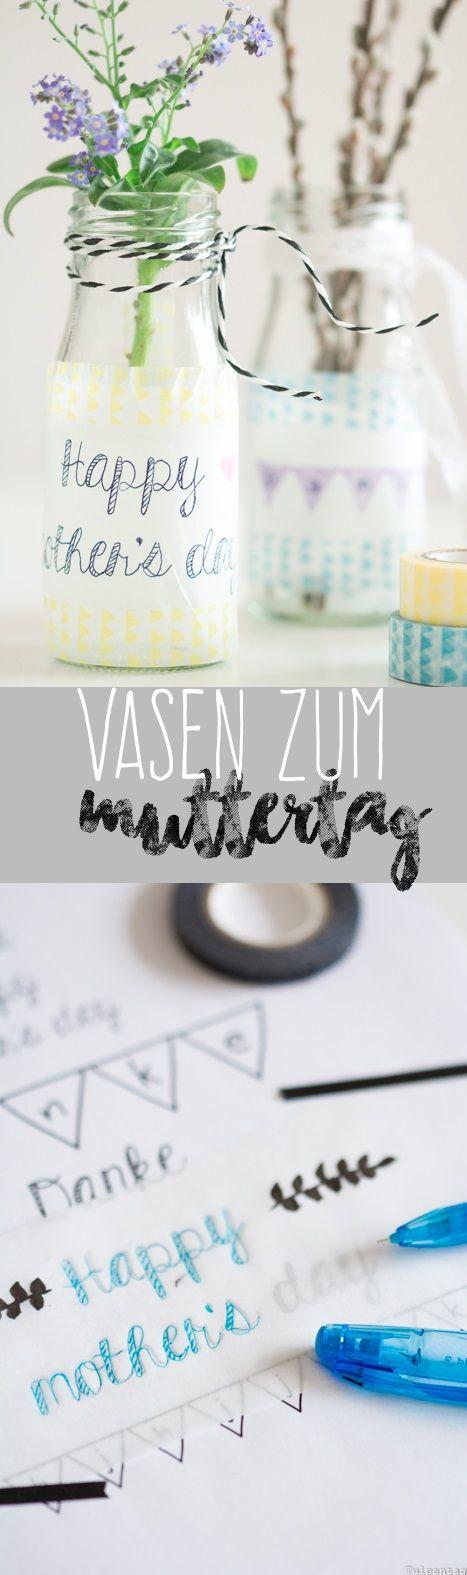 DIY Muttertag Geschenk Bumen Vase Lettering